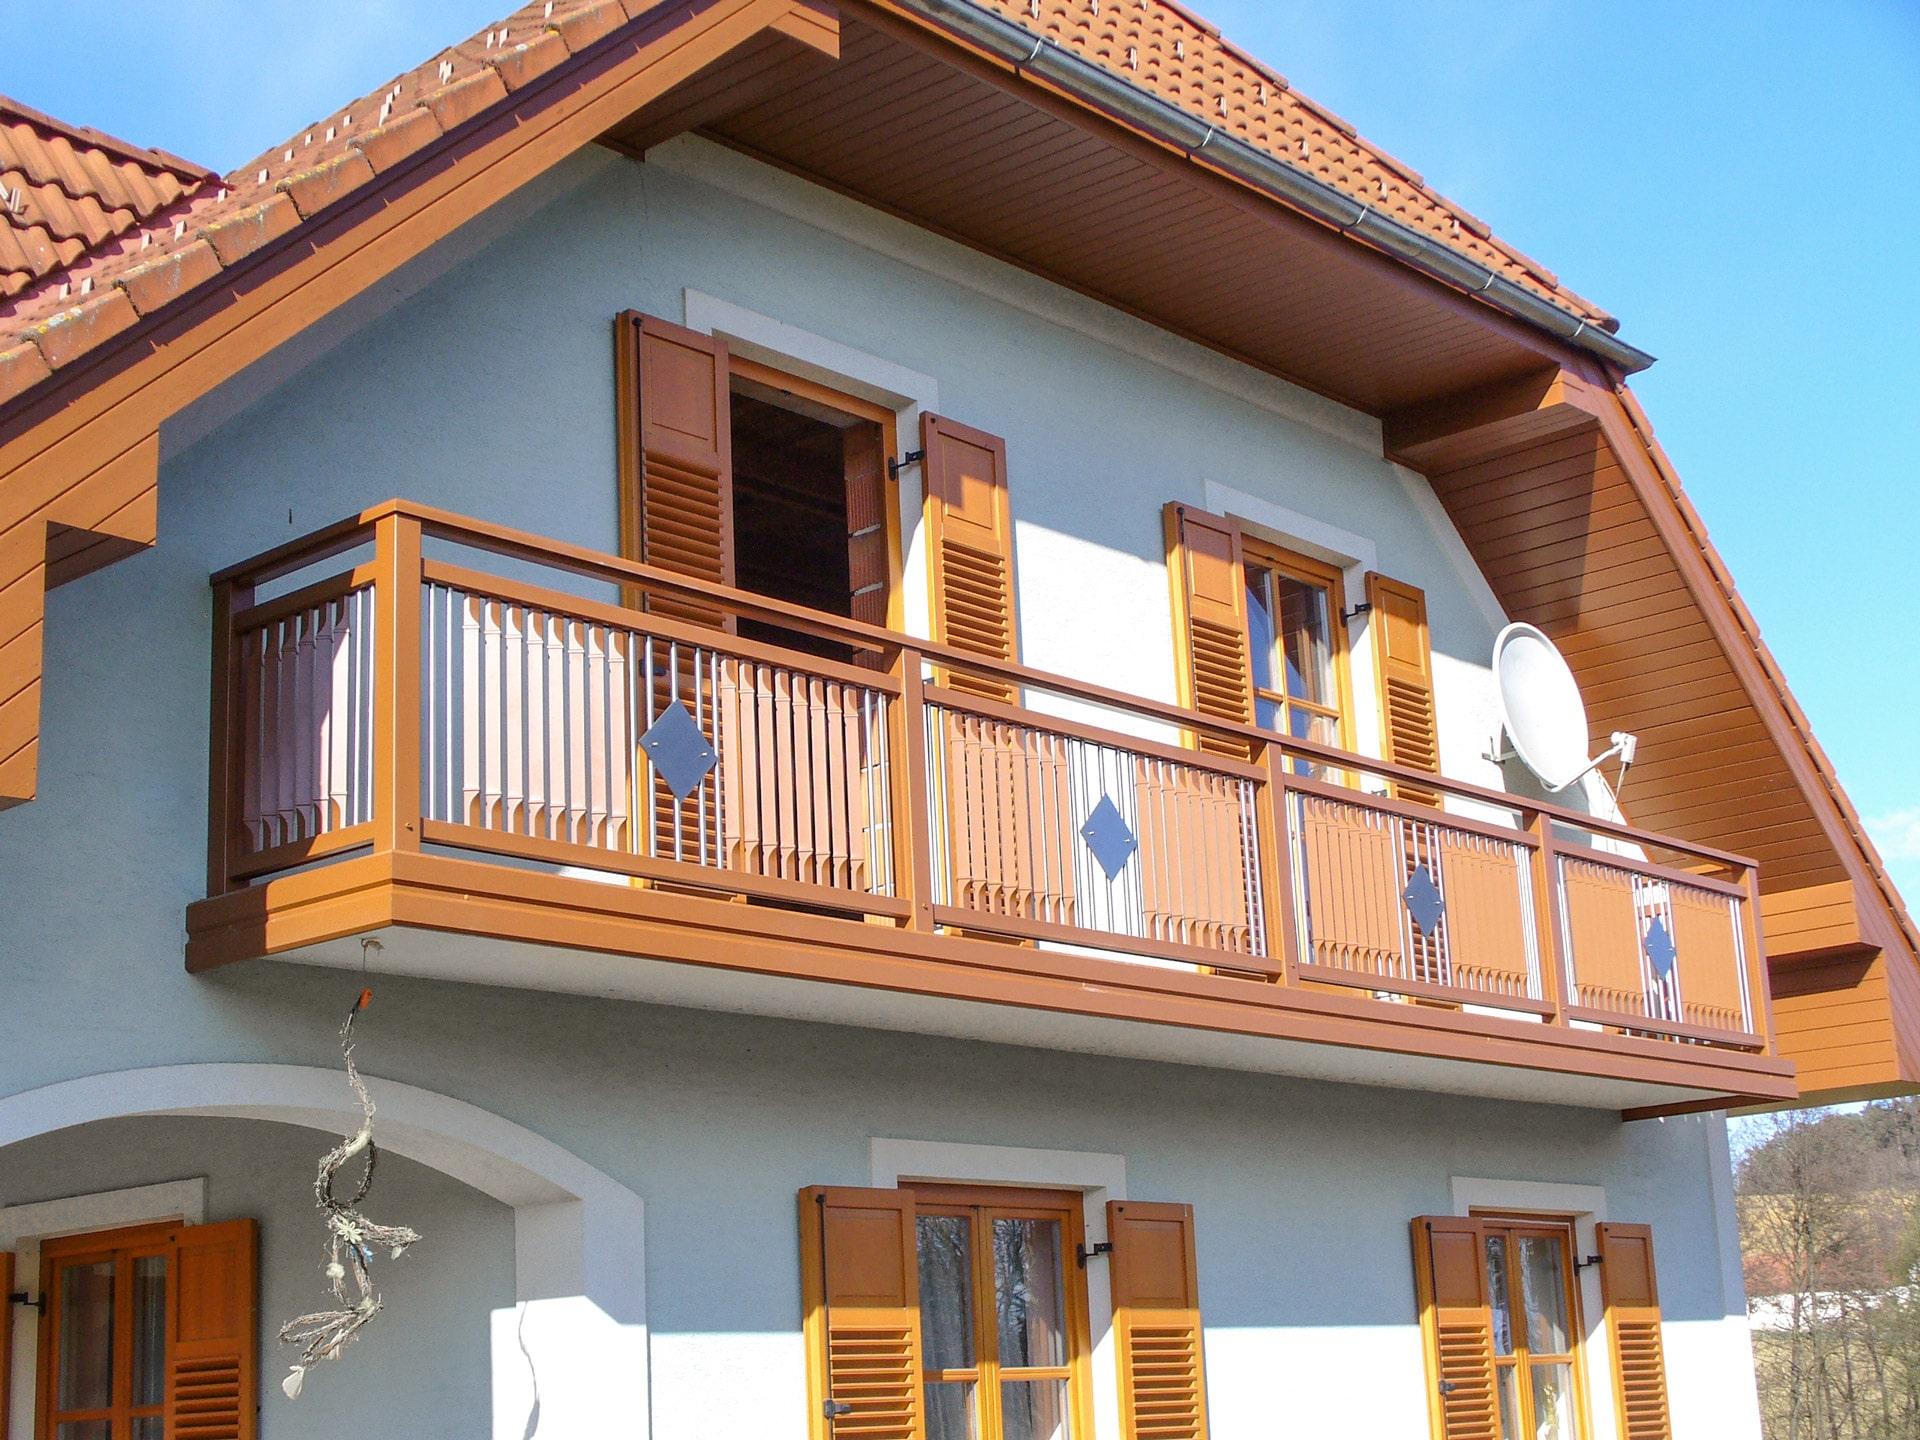 Braunau 01 a | orangebrauner Alu-Balkon mit senkrechter Alu-Niro Füllung, 1 Quadrat-Blech | Svoboda